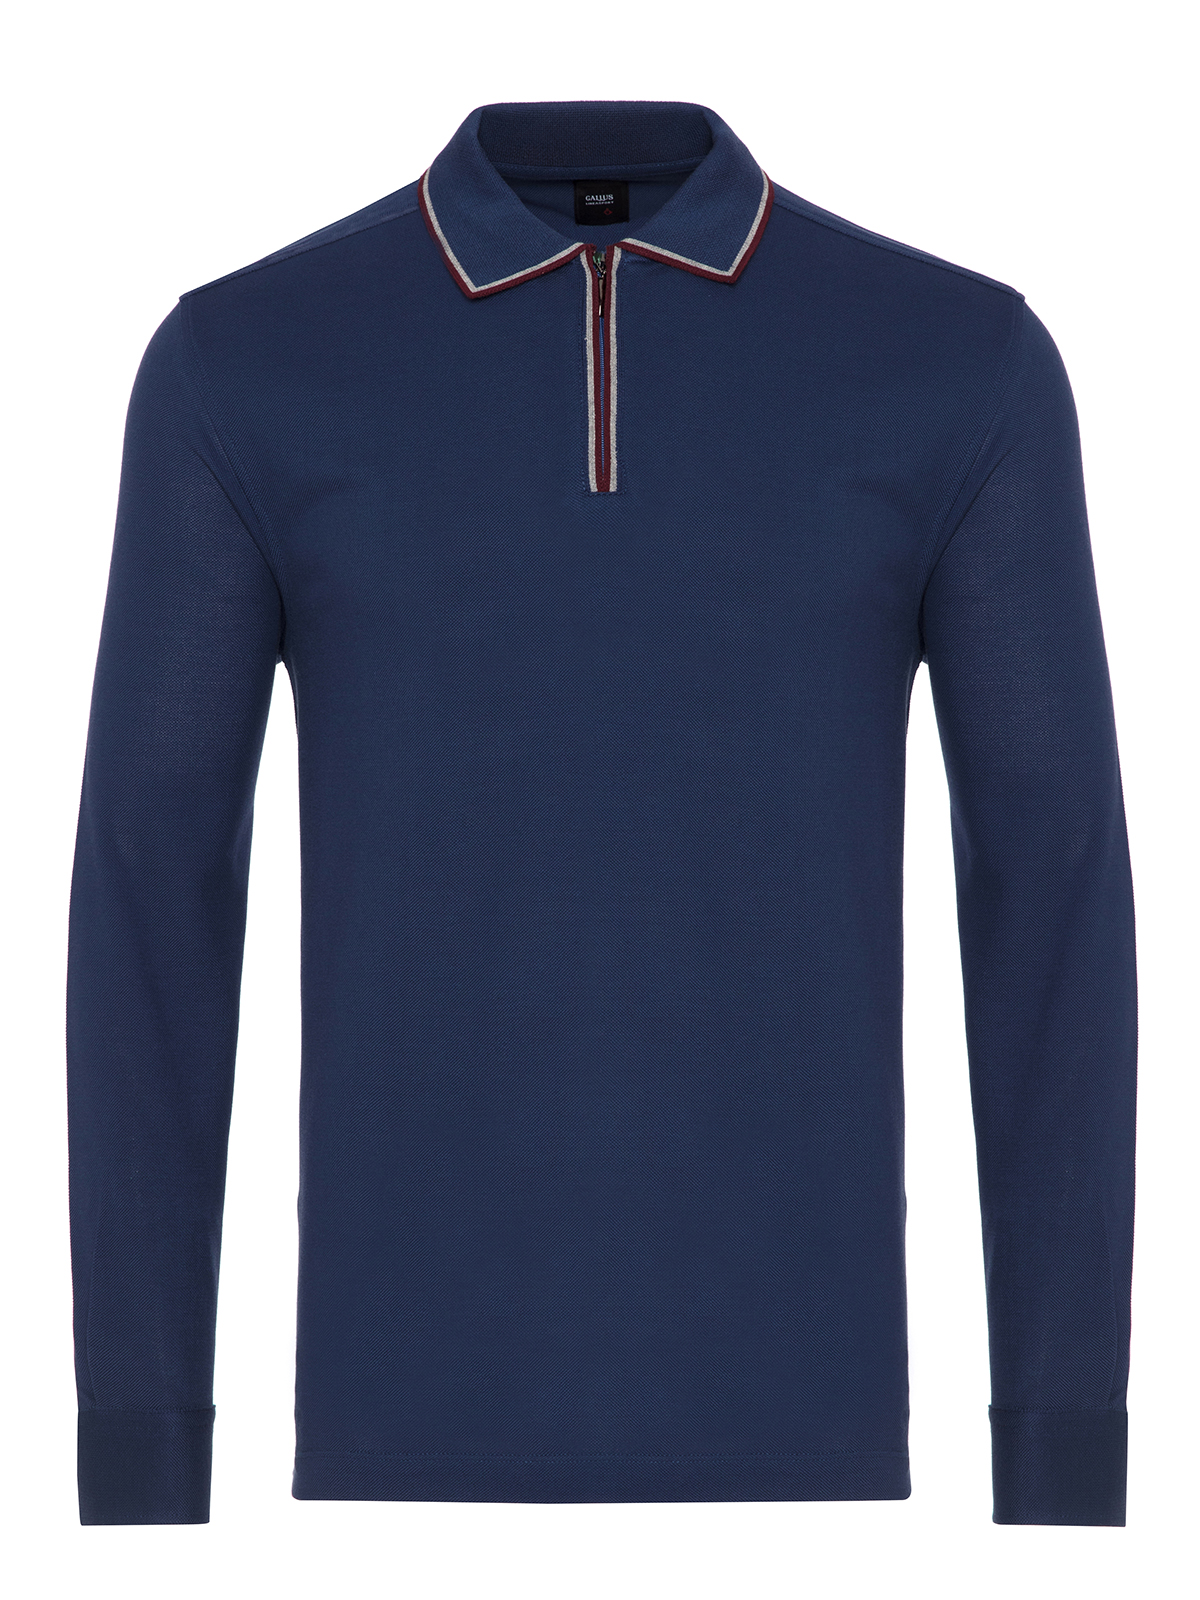 Gallus - Gallus Koyu Mavi Piquet Filo Di Scozia Polo Yaka Fermuarlı Tailor Fit Uzun Kollu T-Shirt